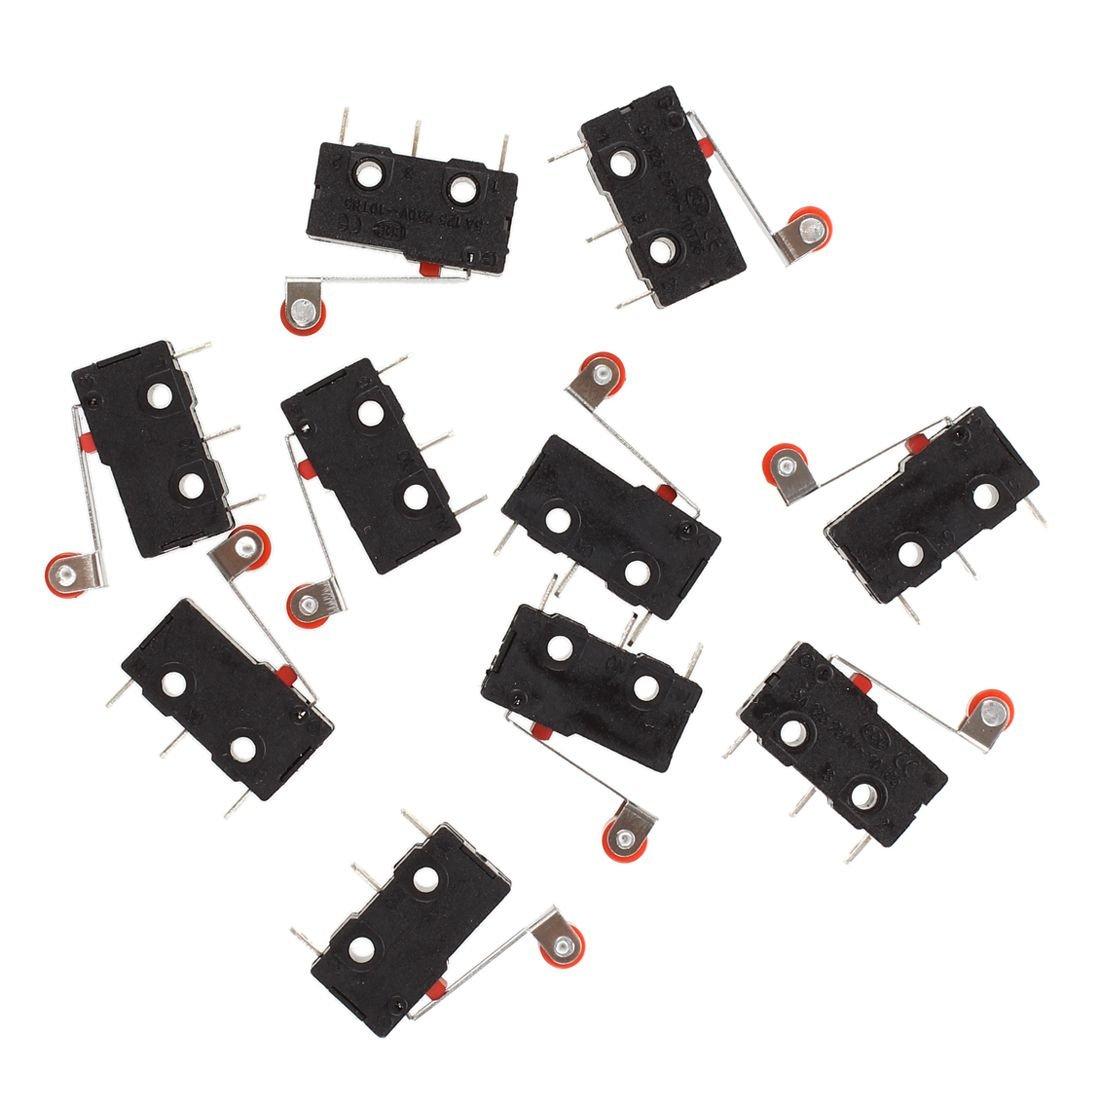 SODIAL(R) 10 Pcs Mini Micro Limit Switch Roller Lever Arm SPDT Snap Action LOT